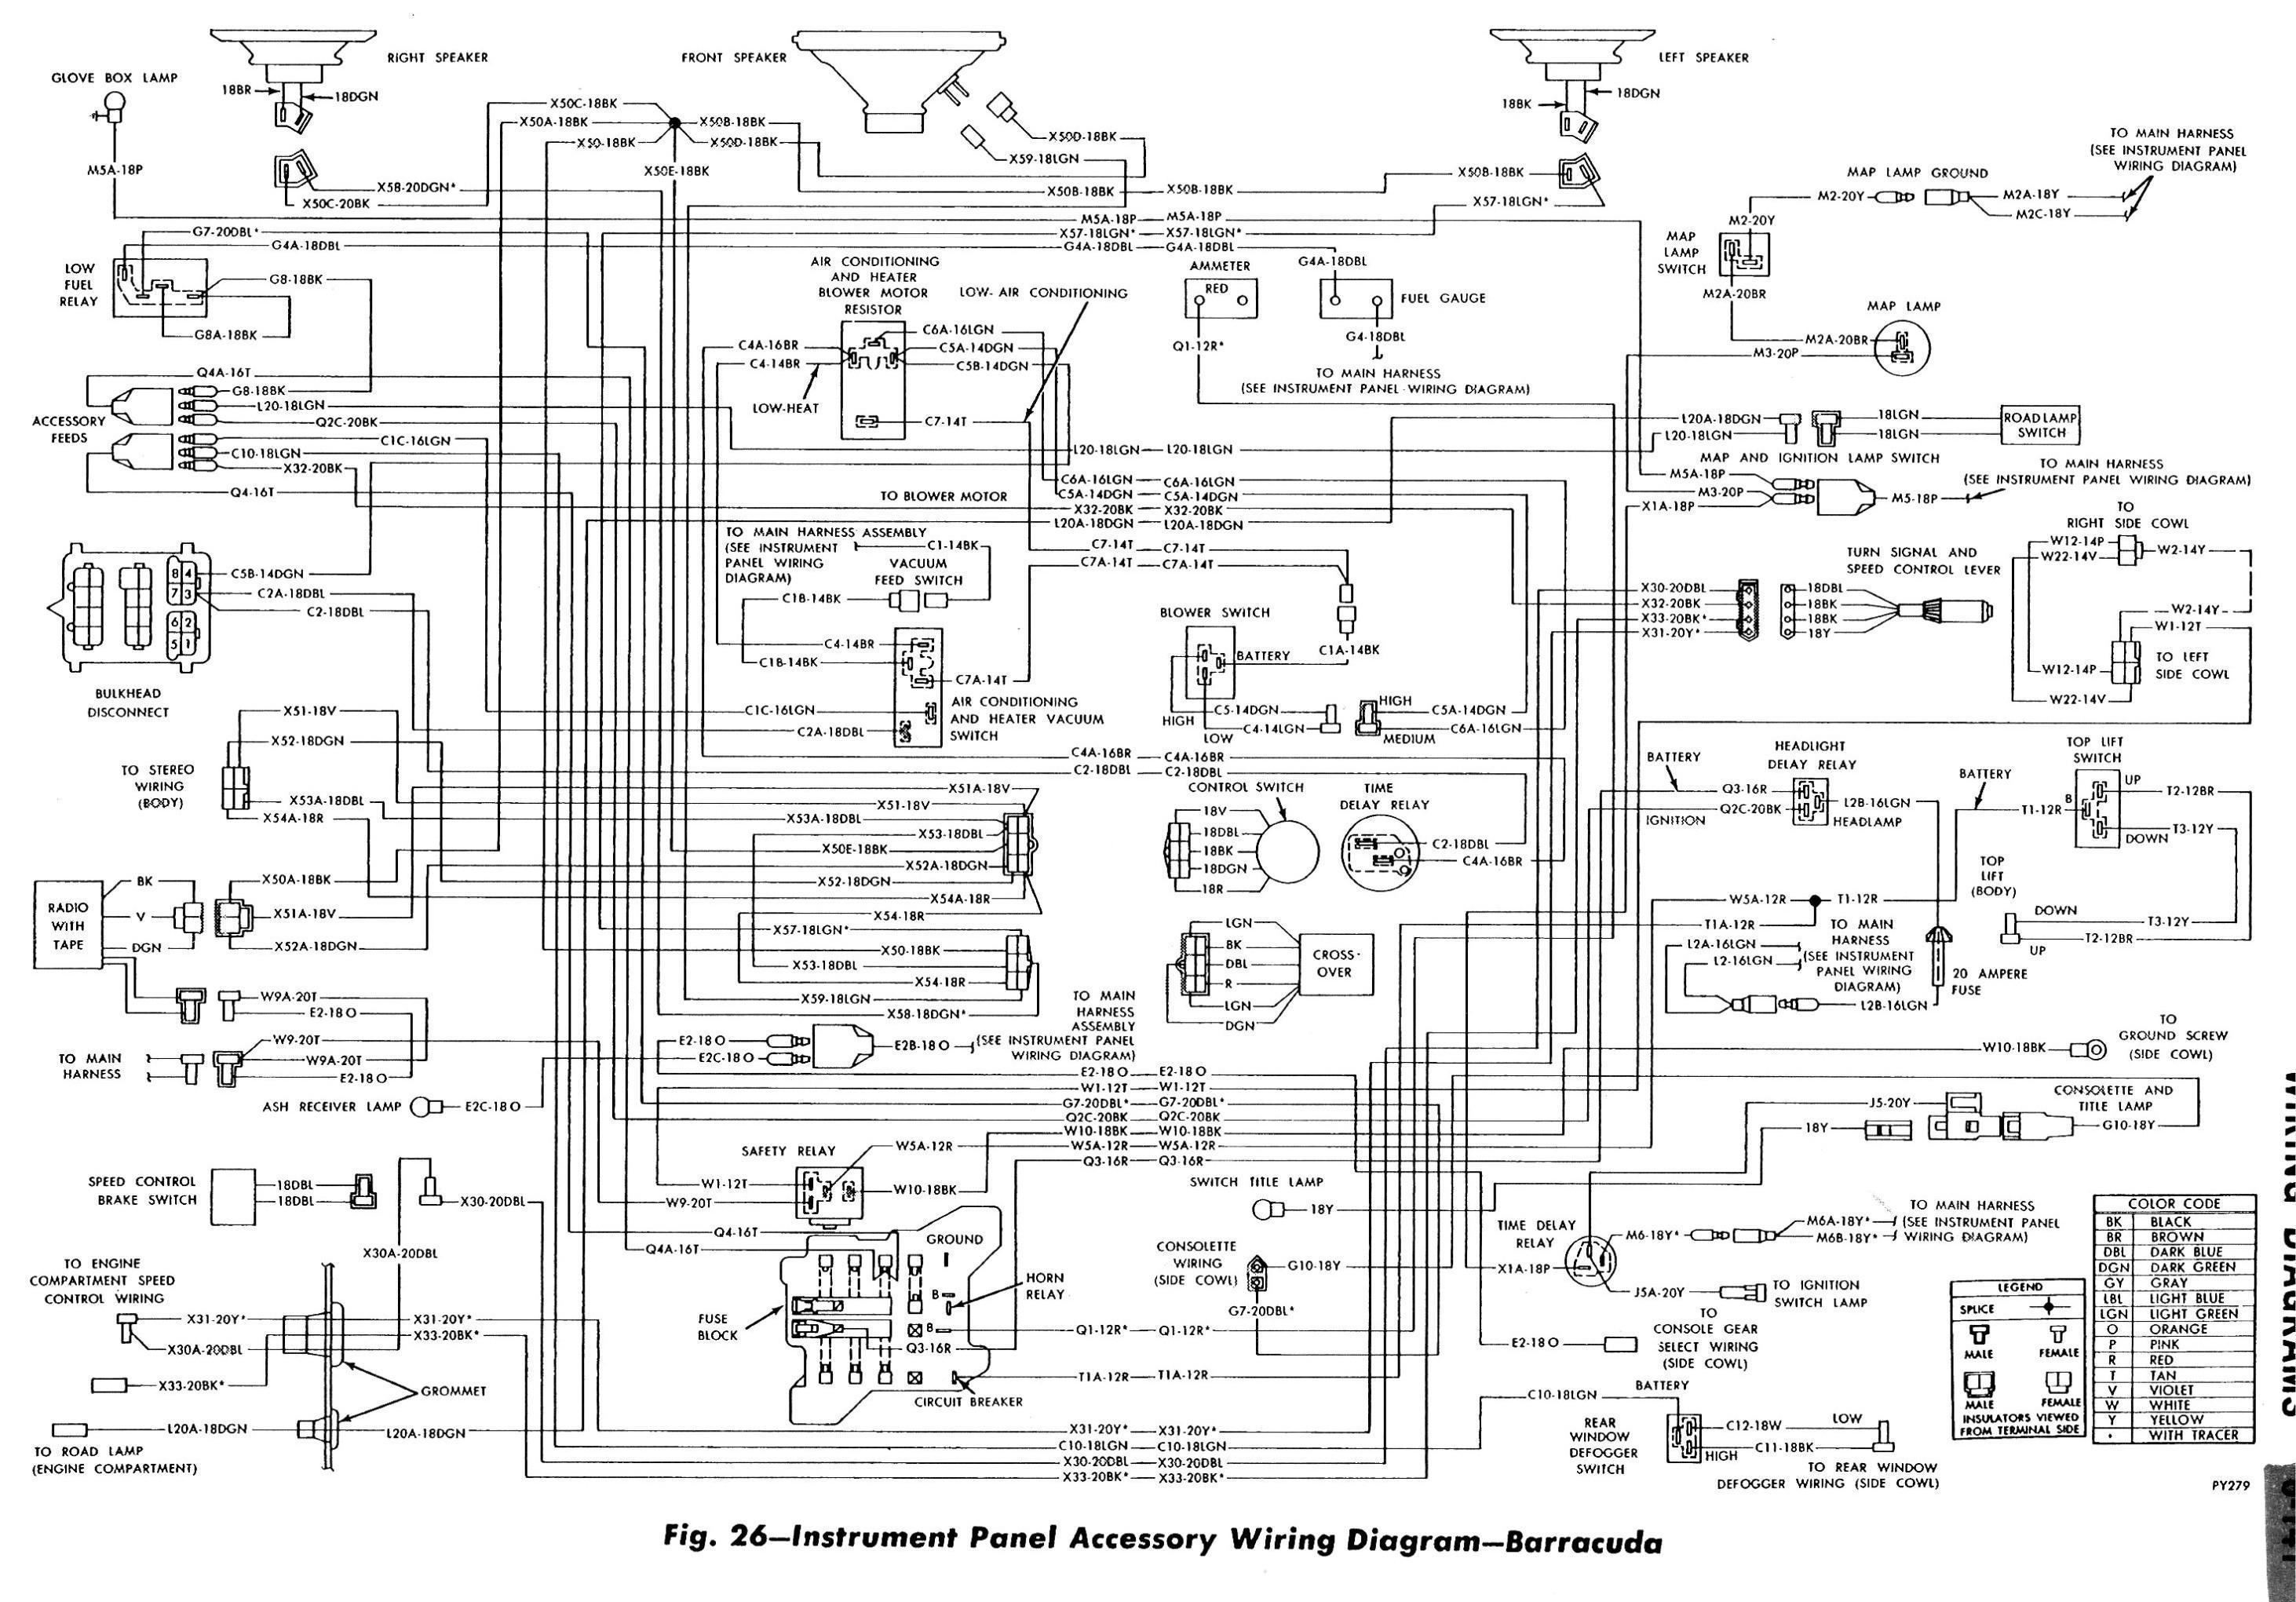 1970 Plymouth Turn Signal Wiring Diagram 2003 Gmc Yukon Denali Wiring Harness For Wiring Diagram Schematics